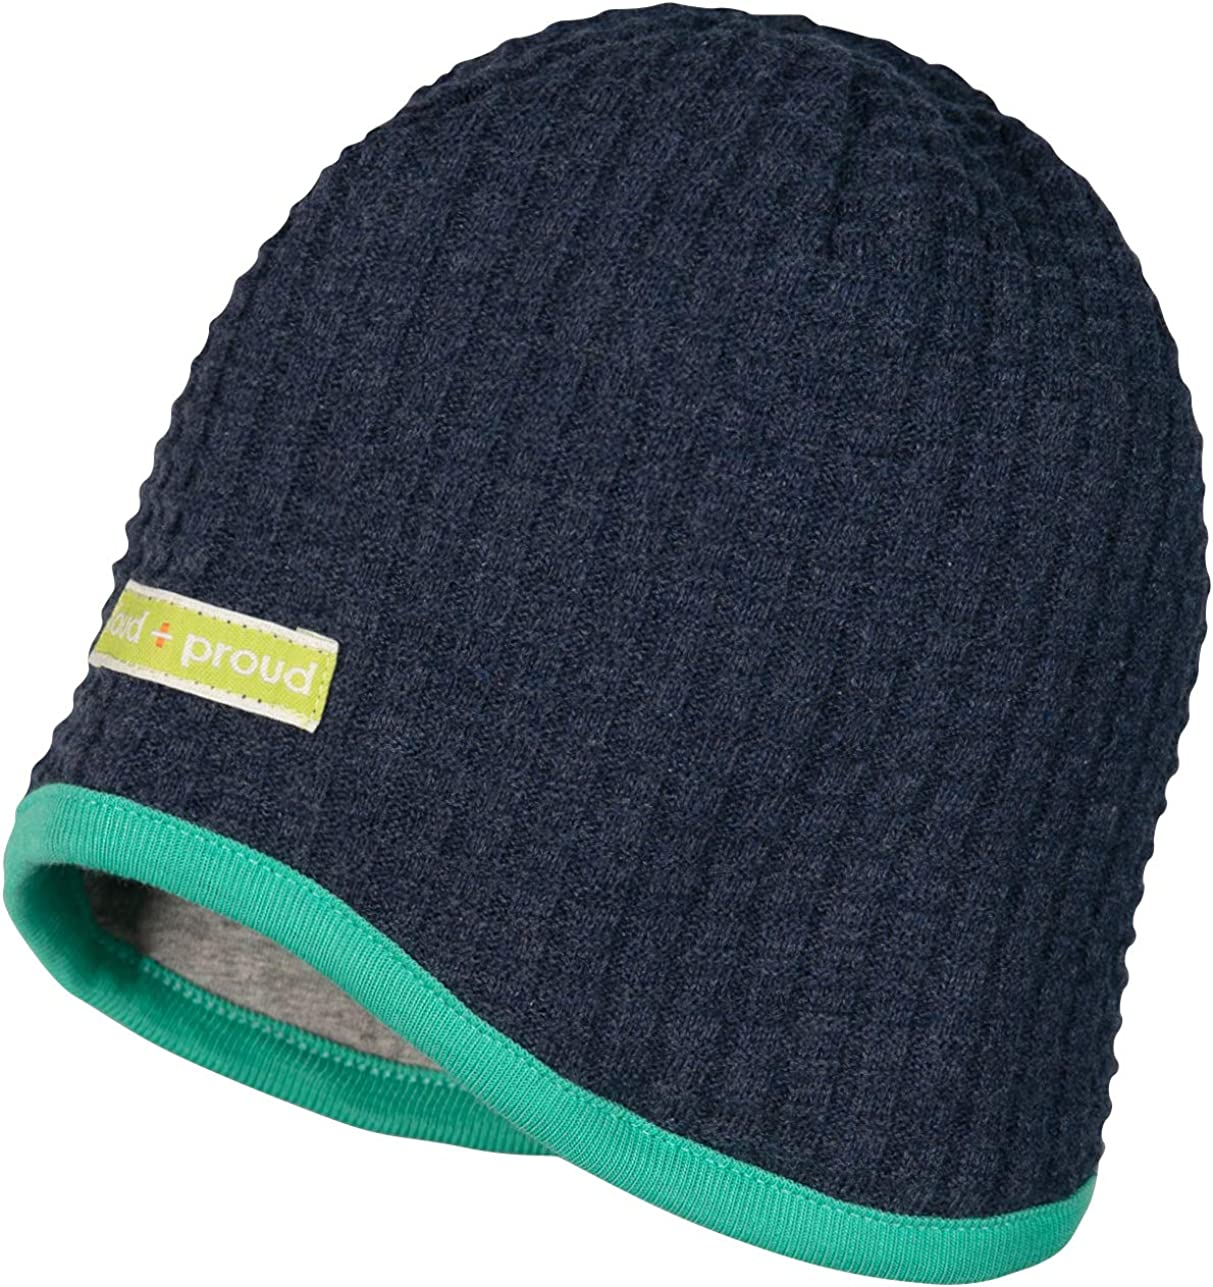 Loud Proud Wendem/ütze Strick Aus Bio Baumwolle Gots Zertifiziert Bonnet Mixte b/éb/é